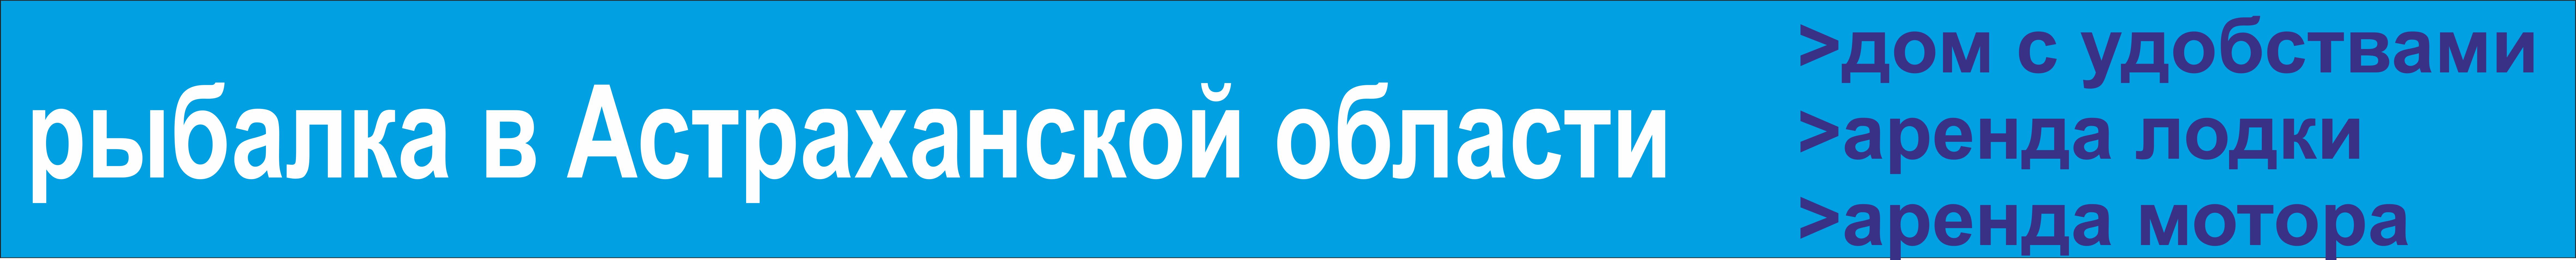 рыбалка1.png